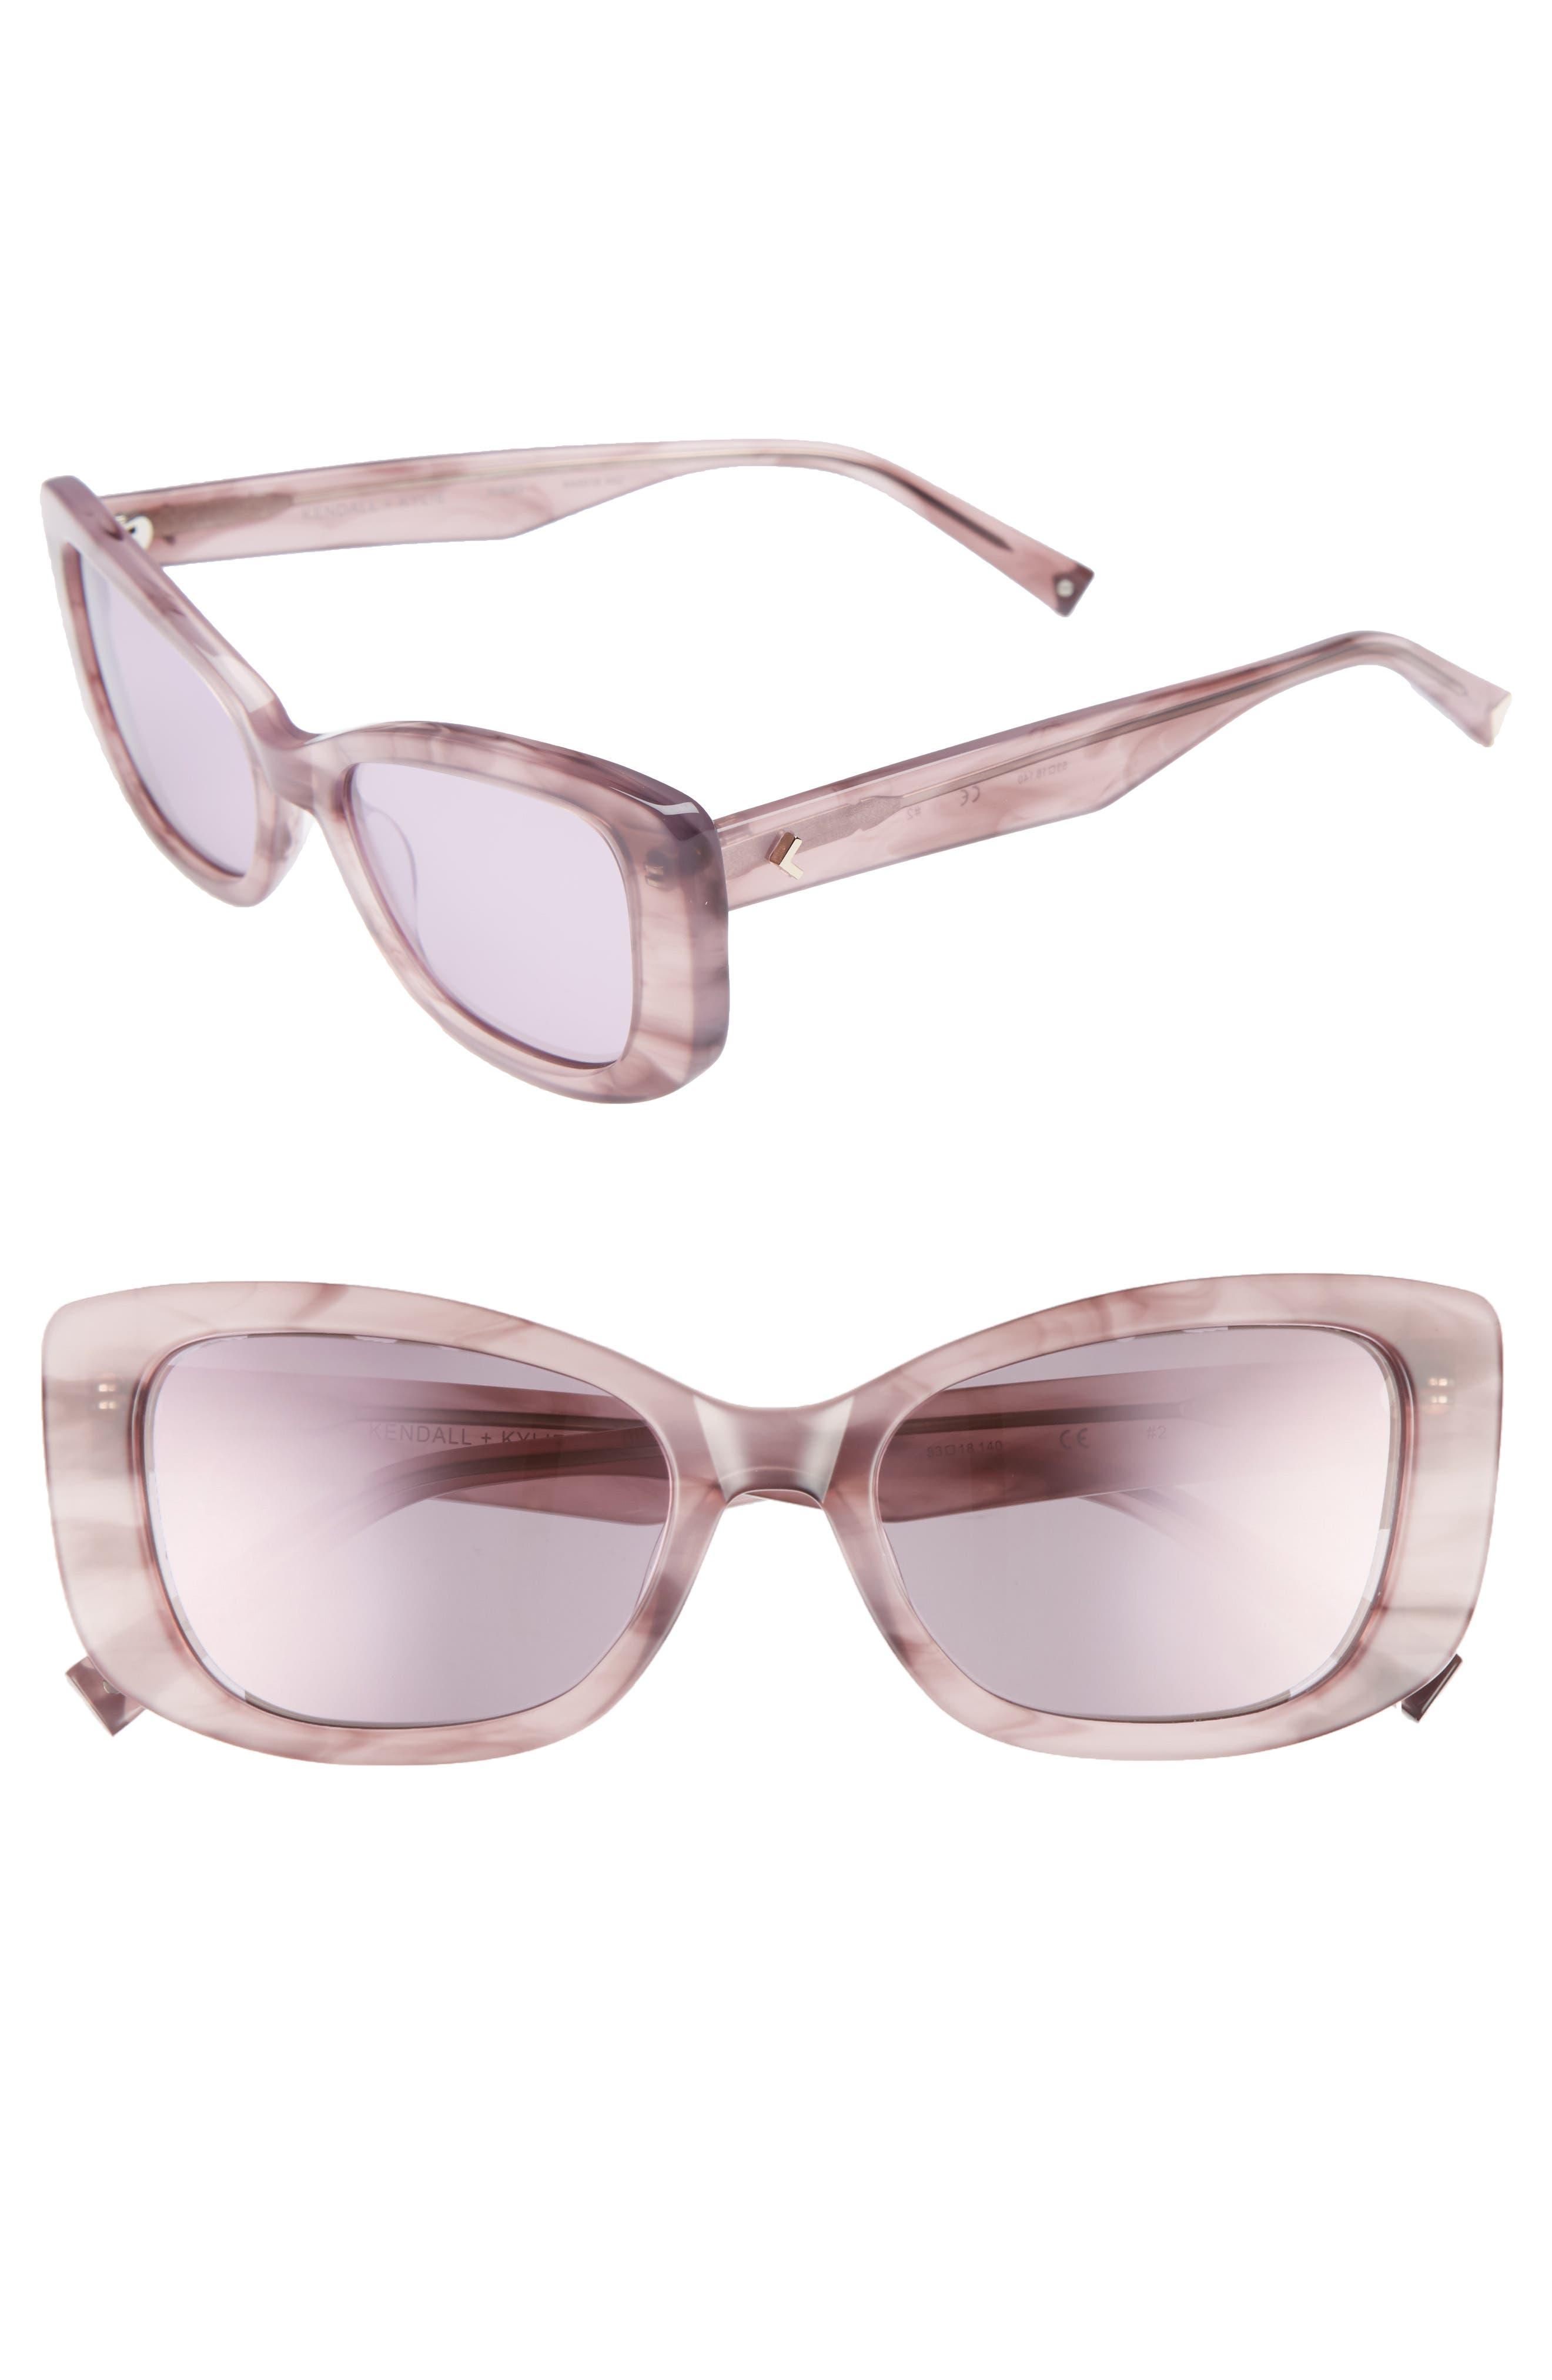 53mm Cat Eye Sunglasses,                         Main,                         color, ROSE HORN